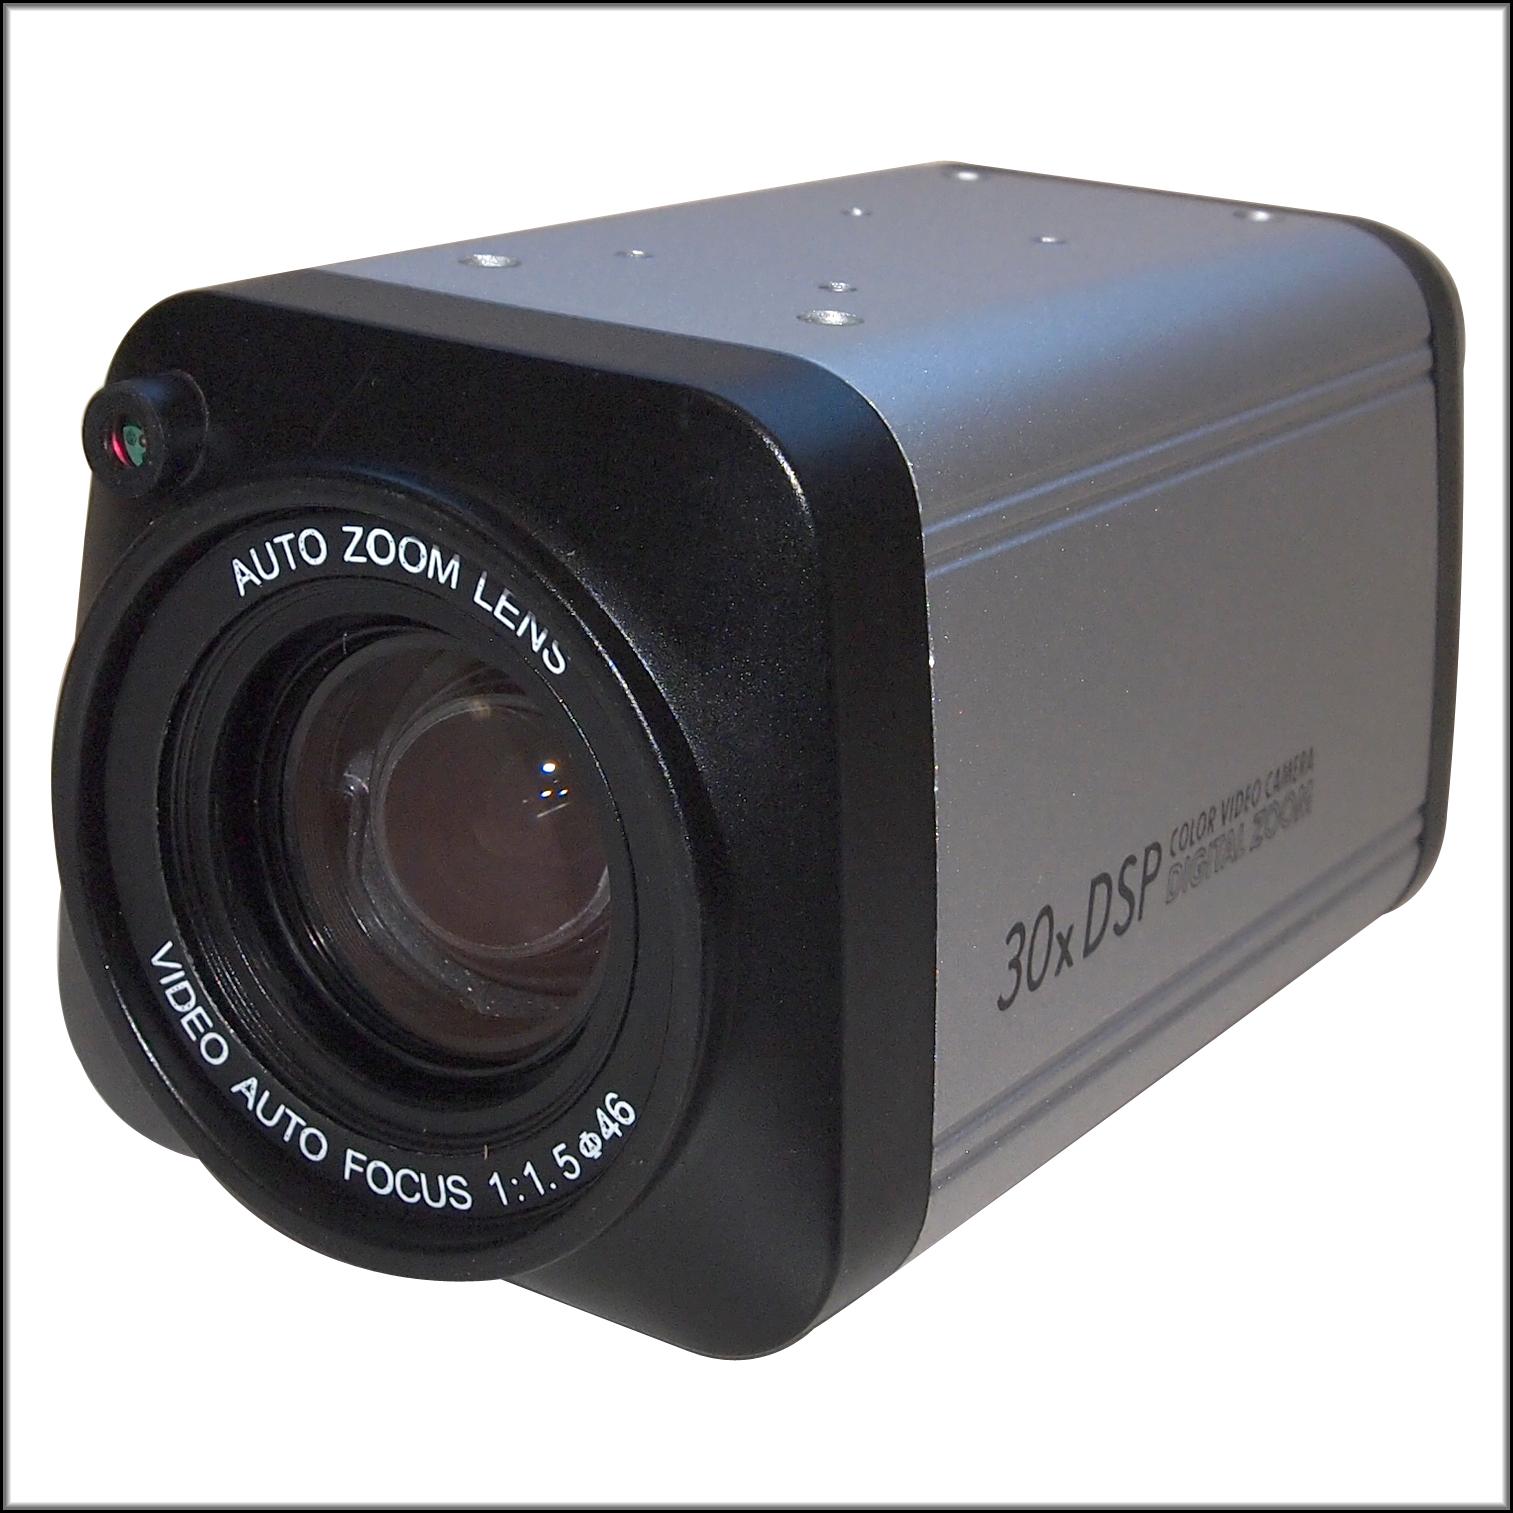 Box Security Cameras